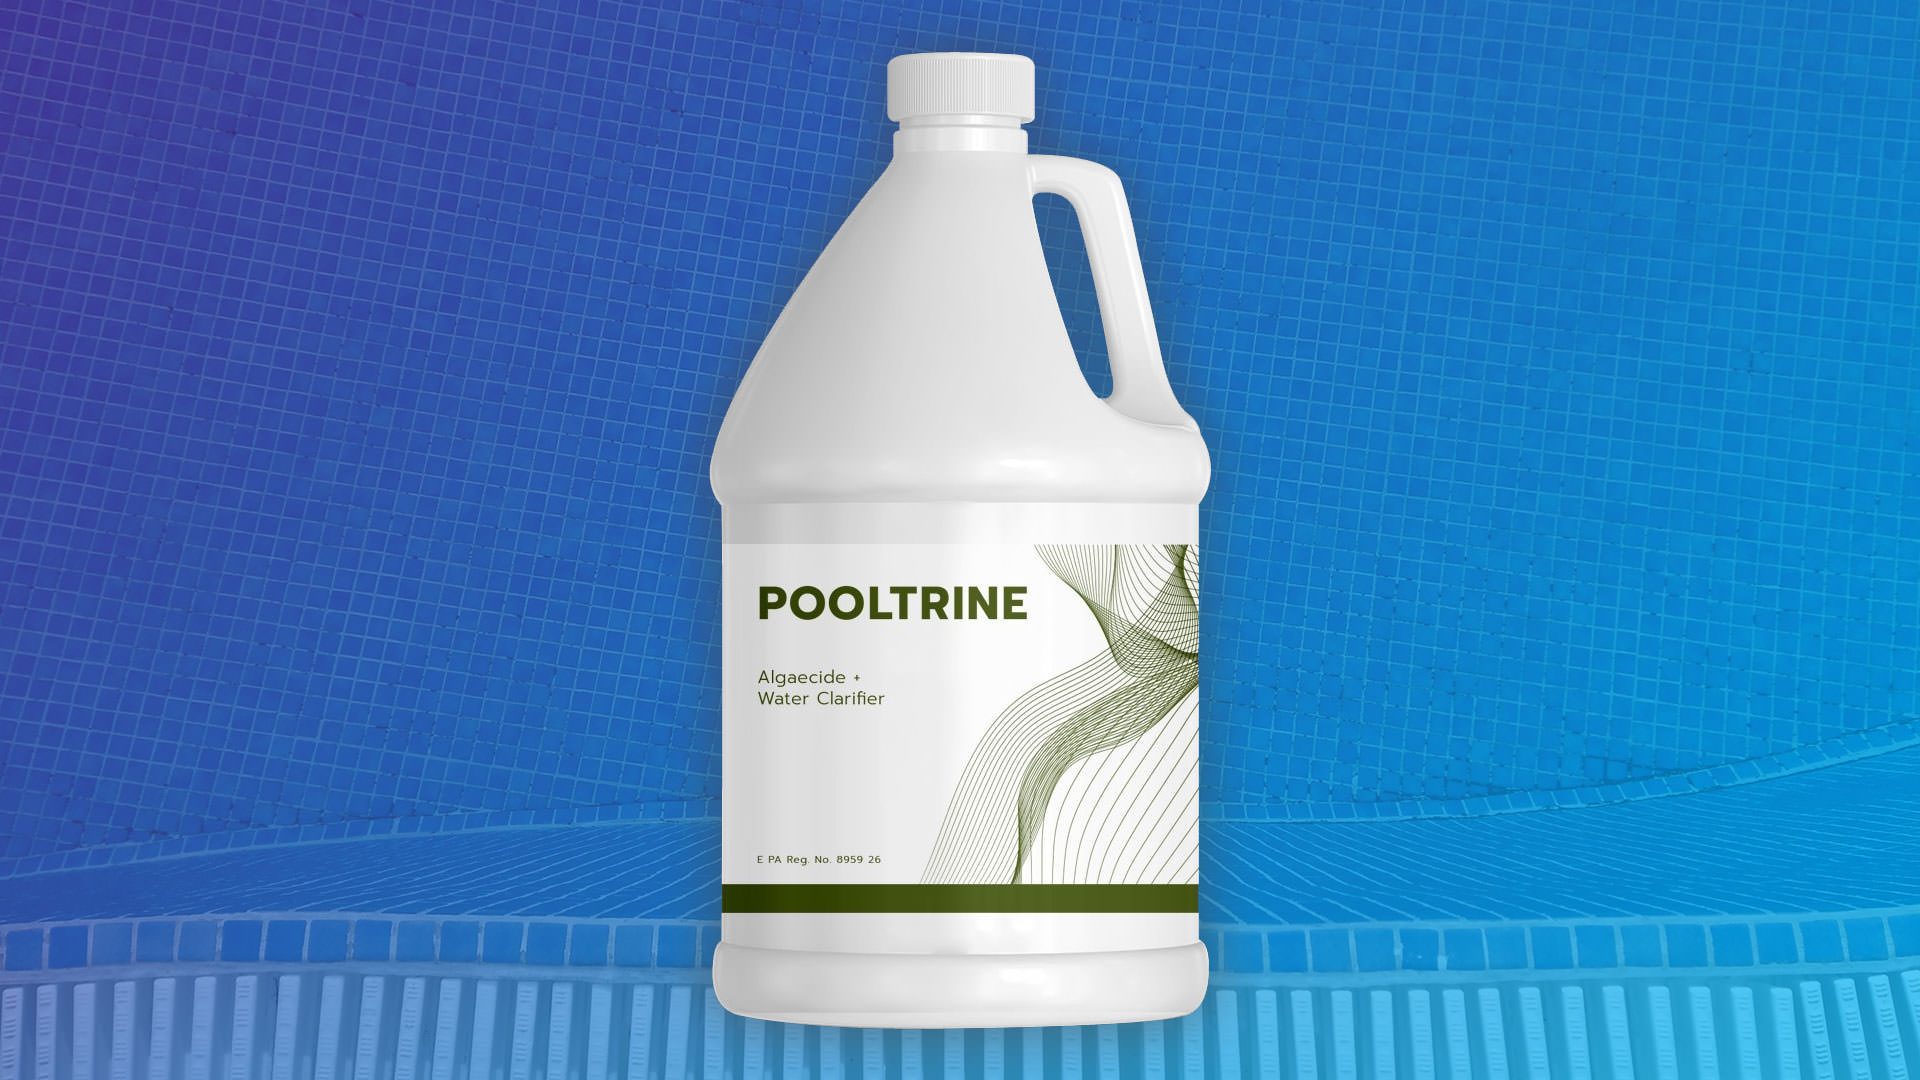 Pooltrine น้ำยาสระว่ายน้ำ